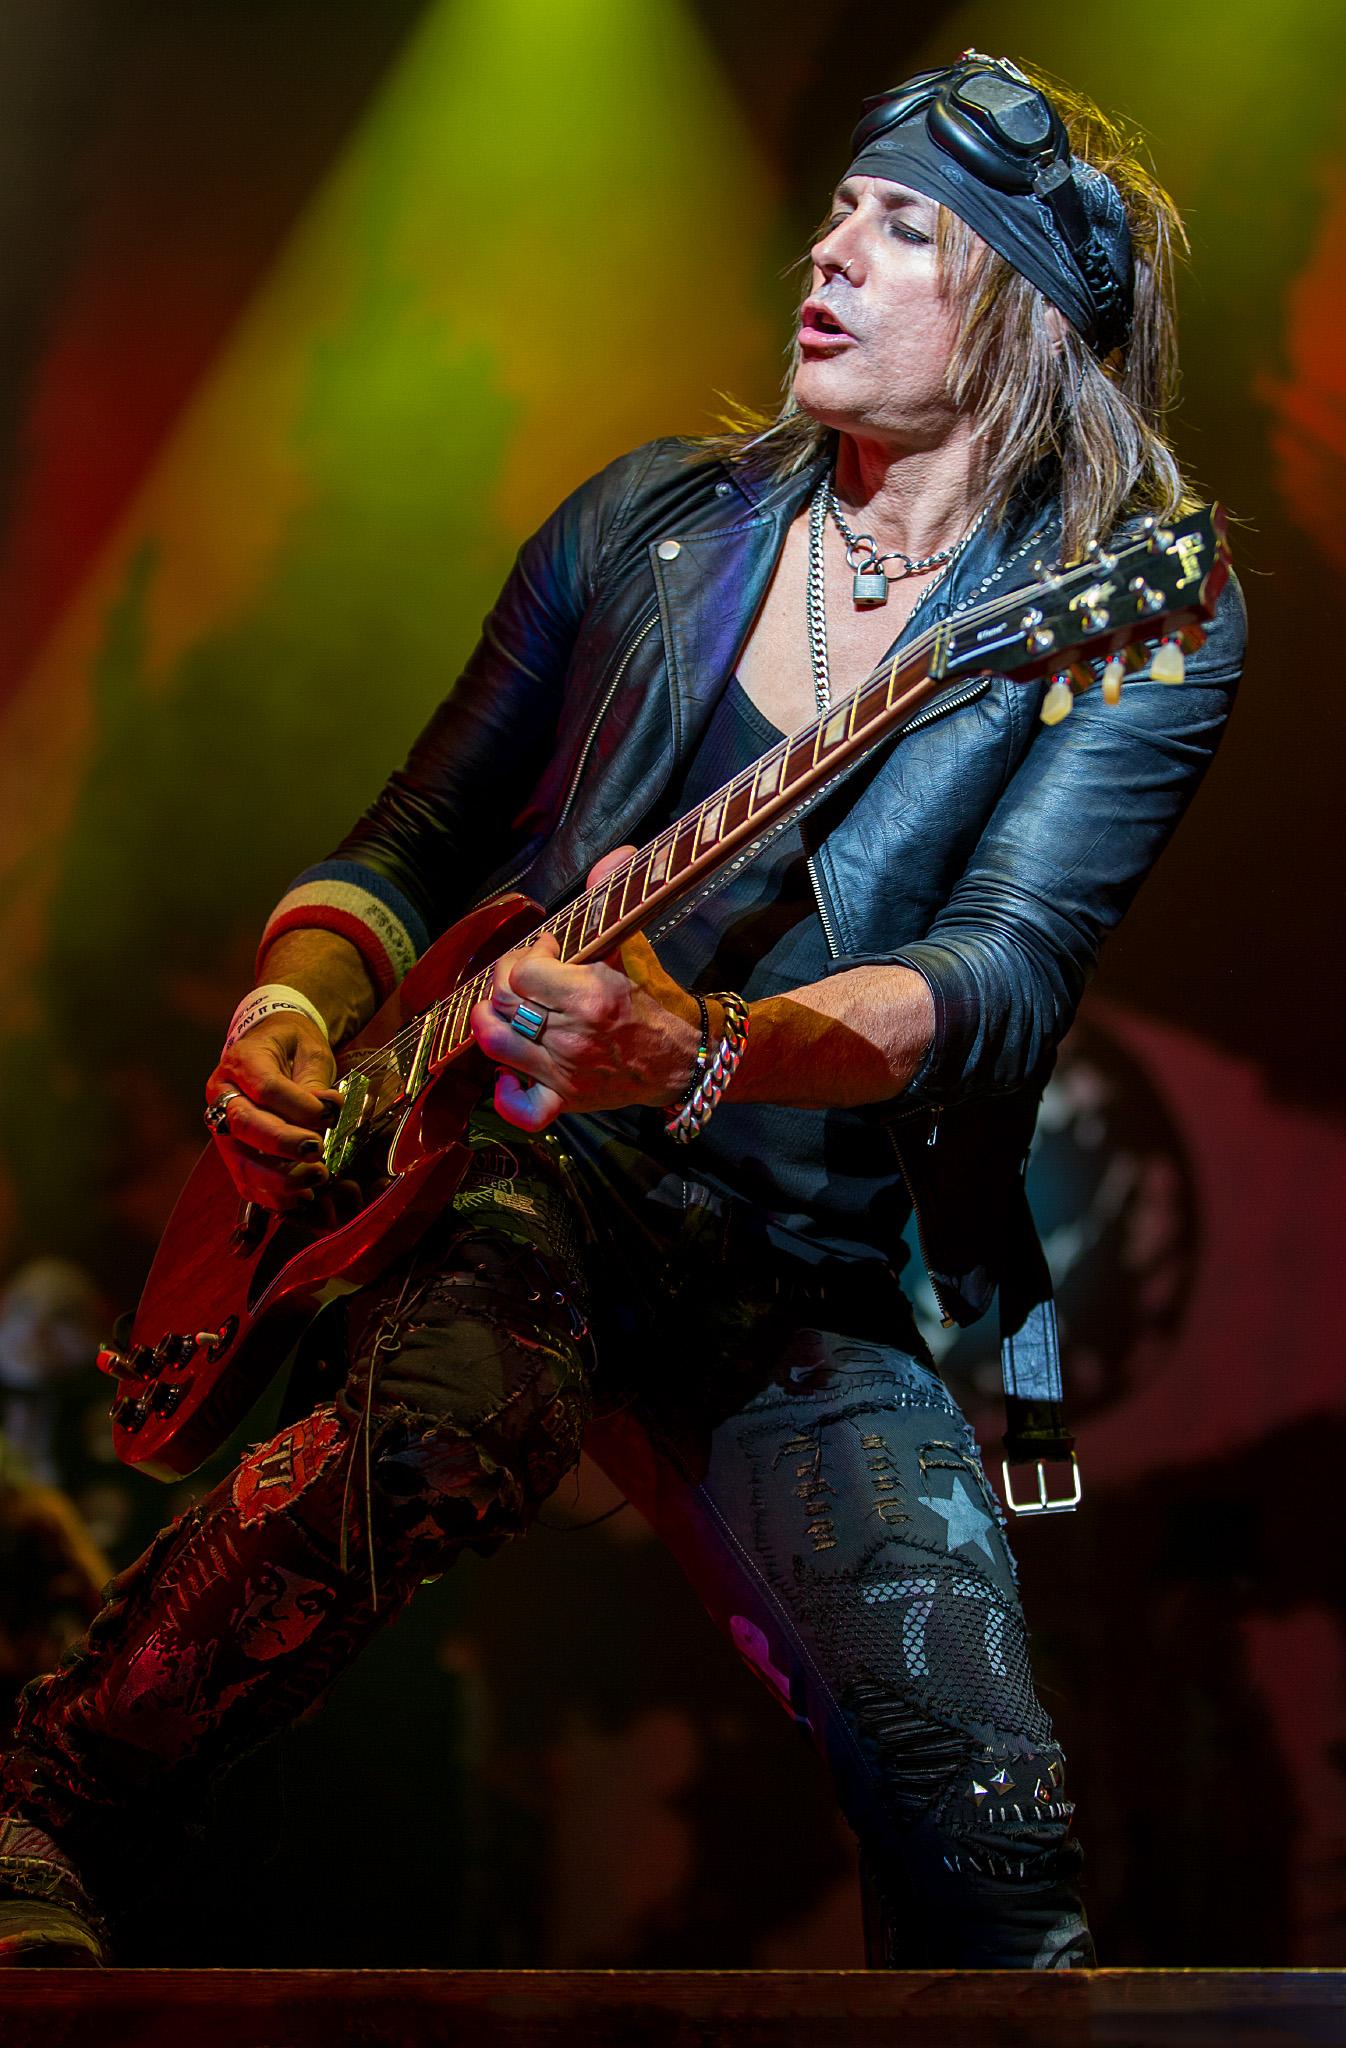 https://upload.wikimedia.org/wikipedia/commons/f/f6/Ryan_Roxie_of_Alice_Cooper_performing_in_San_Antonio%2C_Texas_2015.jpg